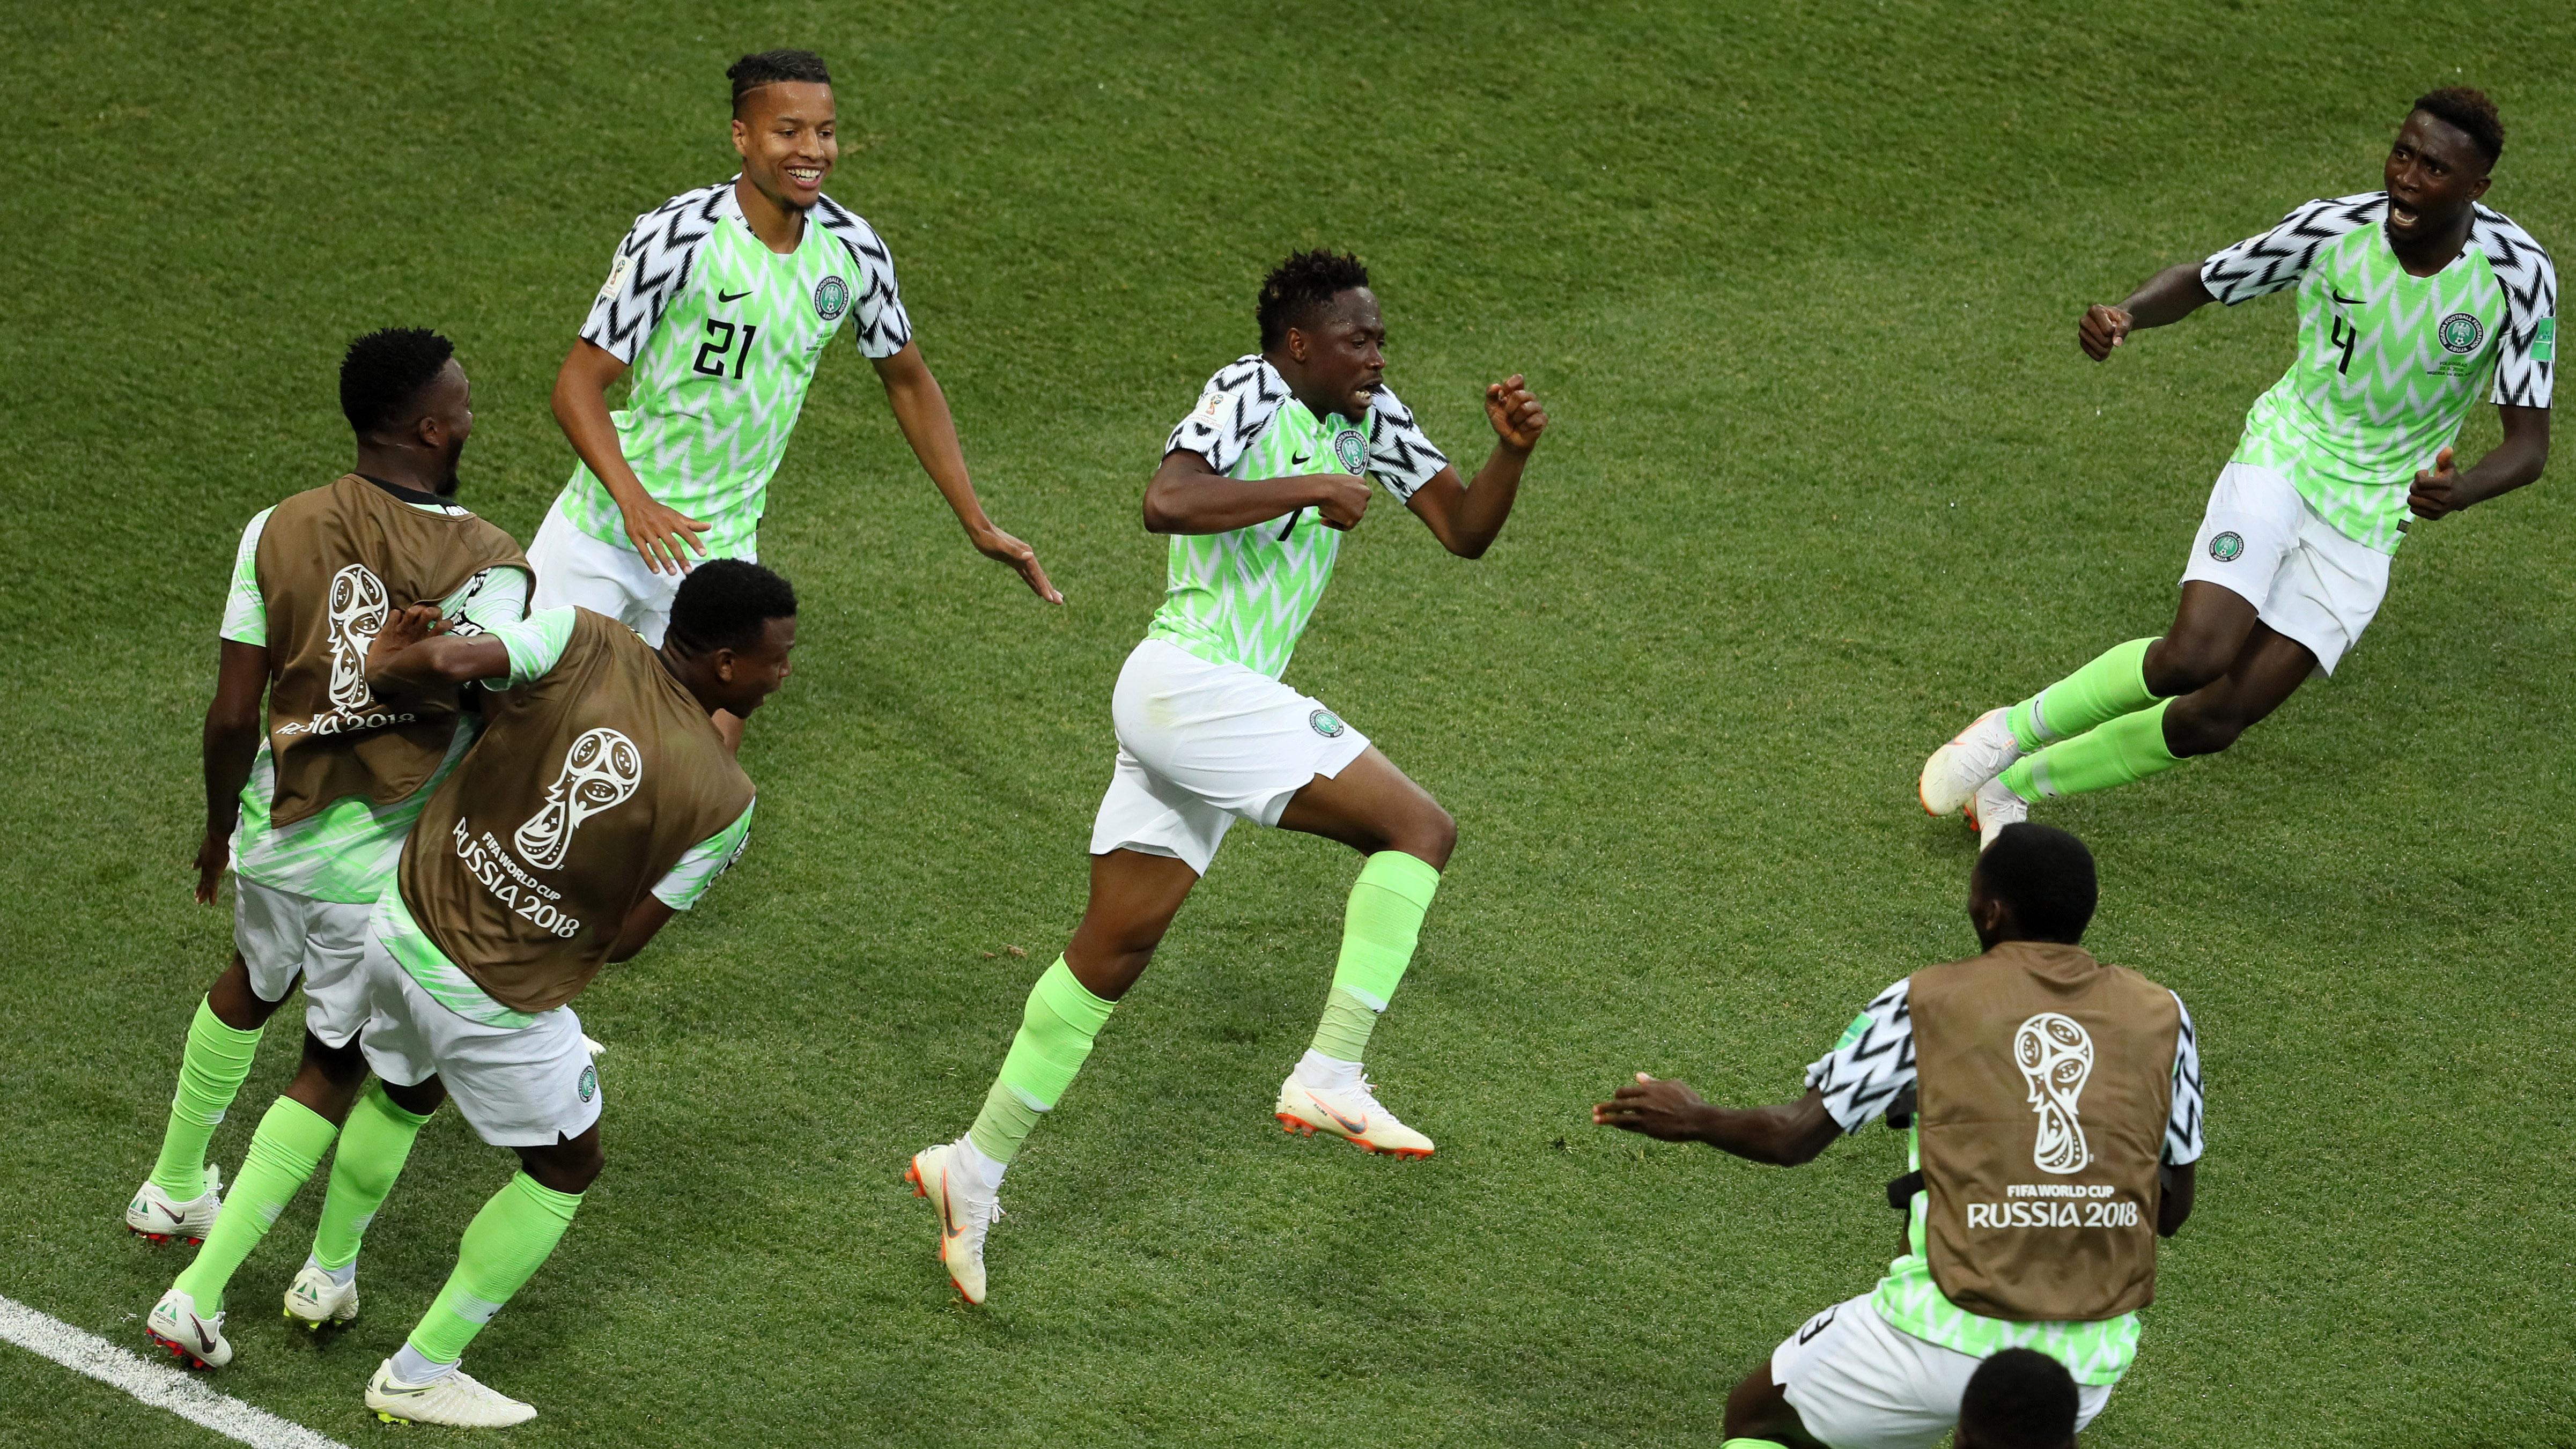 Nigeria Iceland World Cup 2018